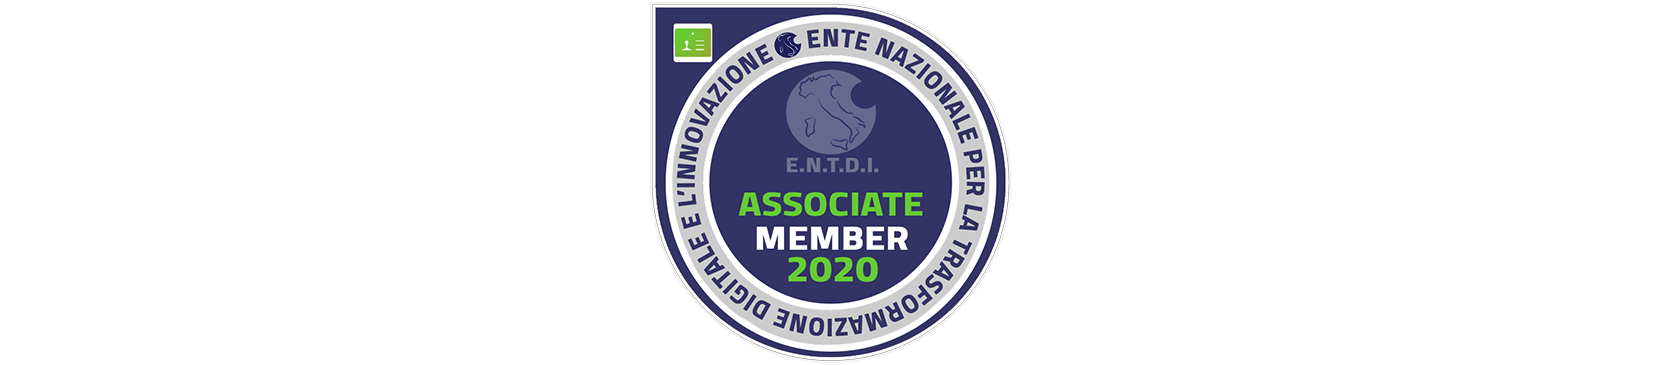 Associate Member ENTD